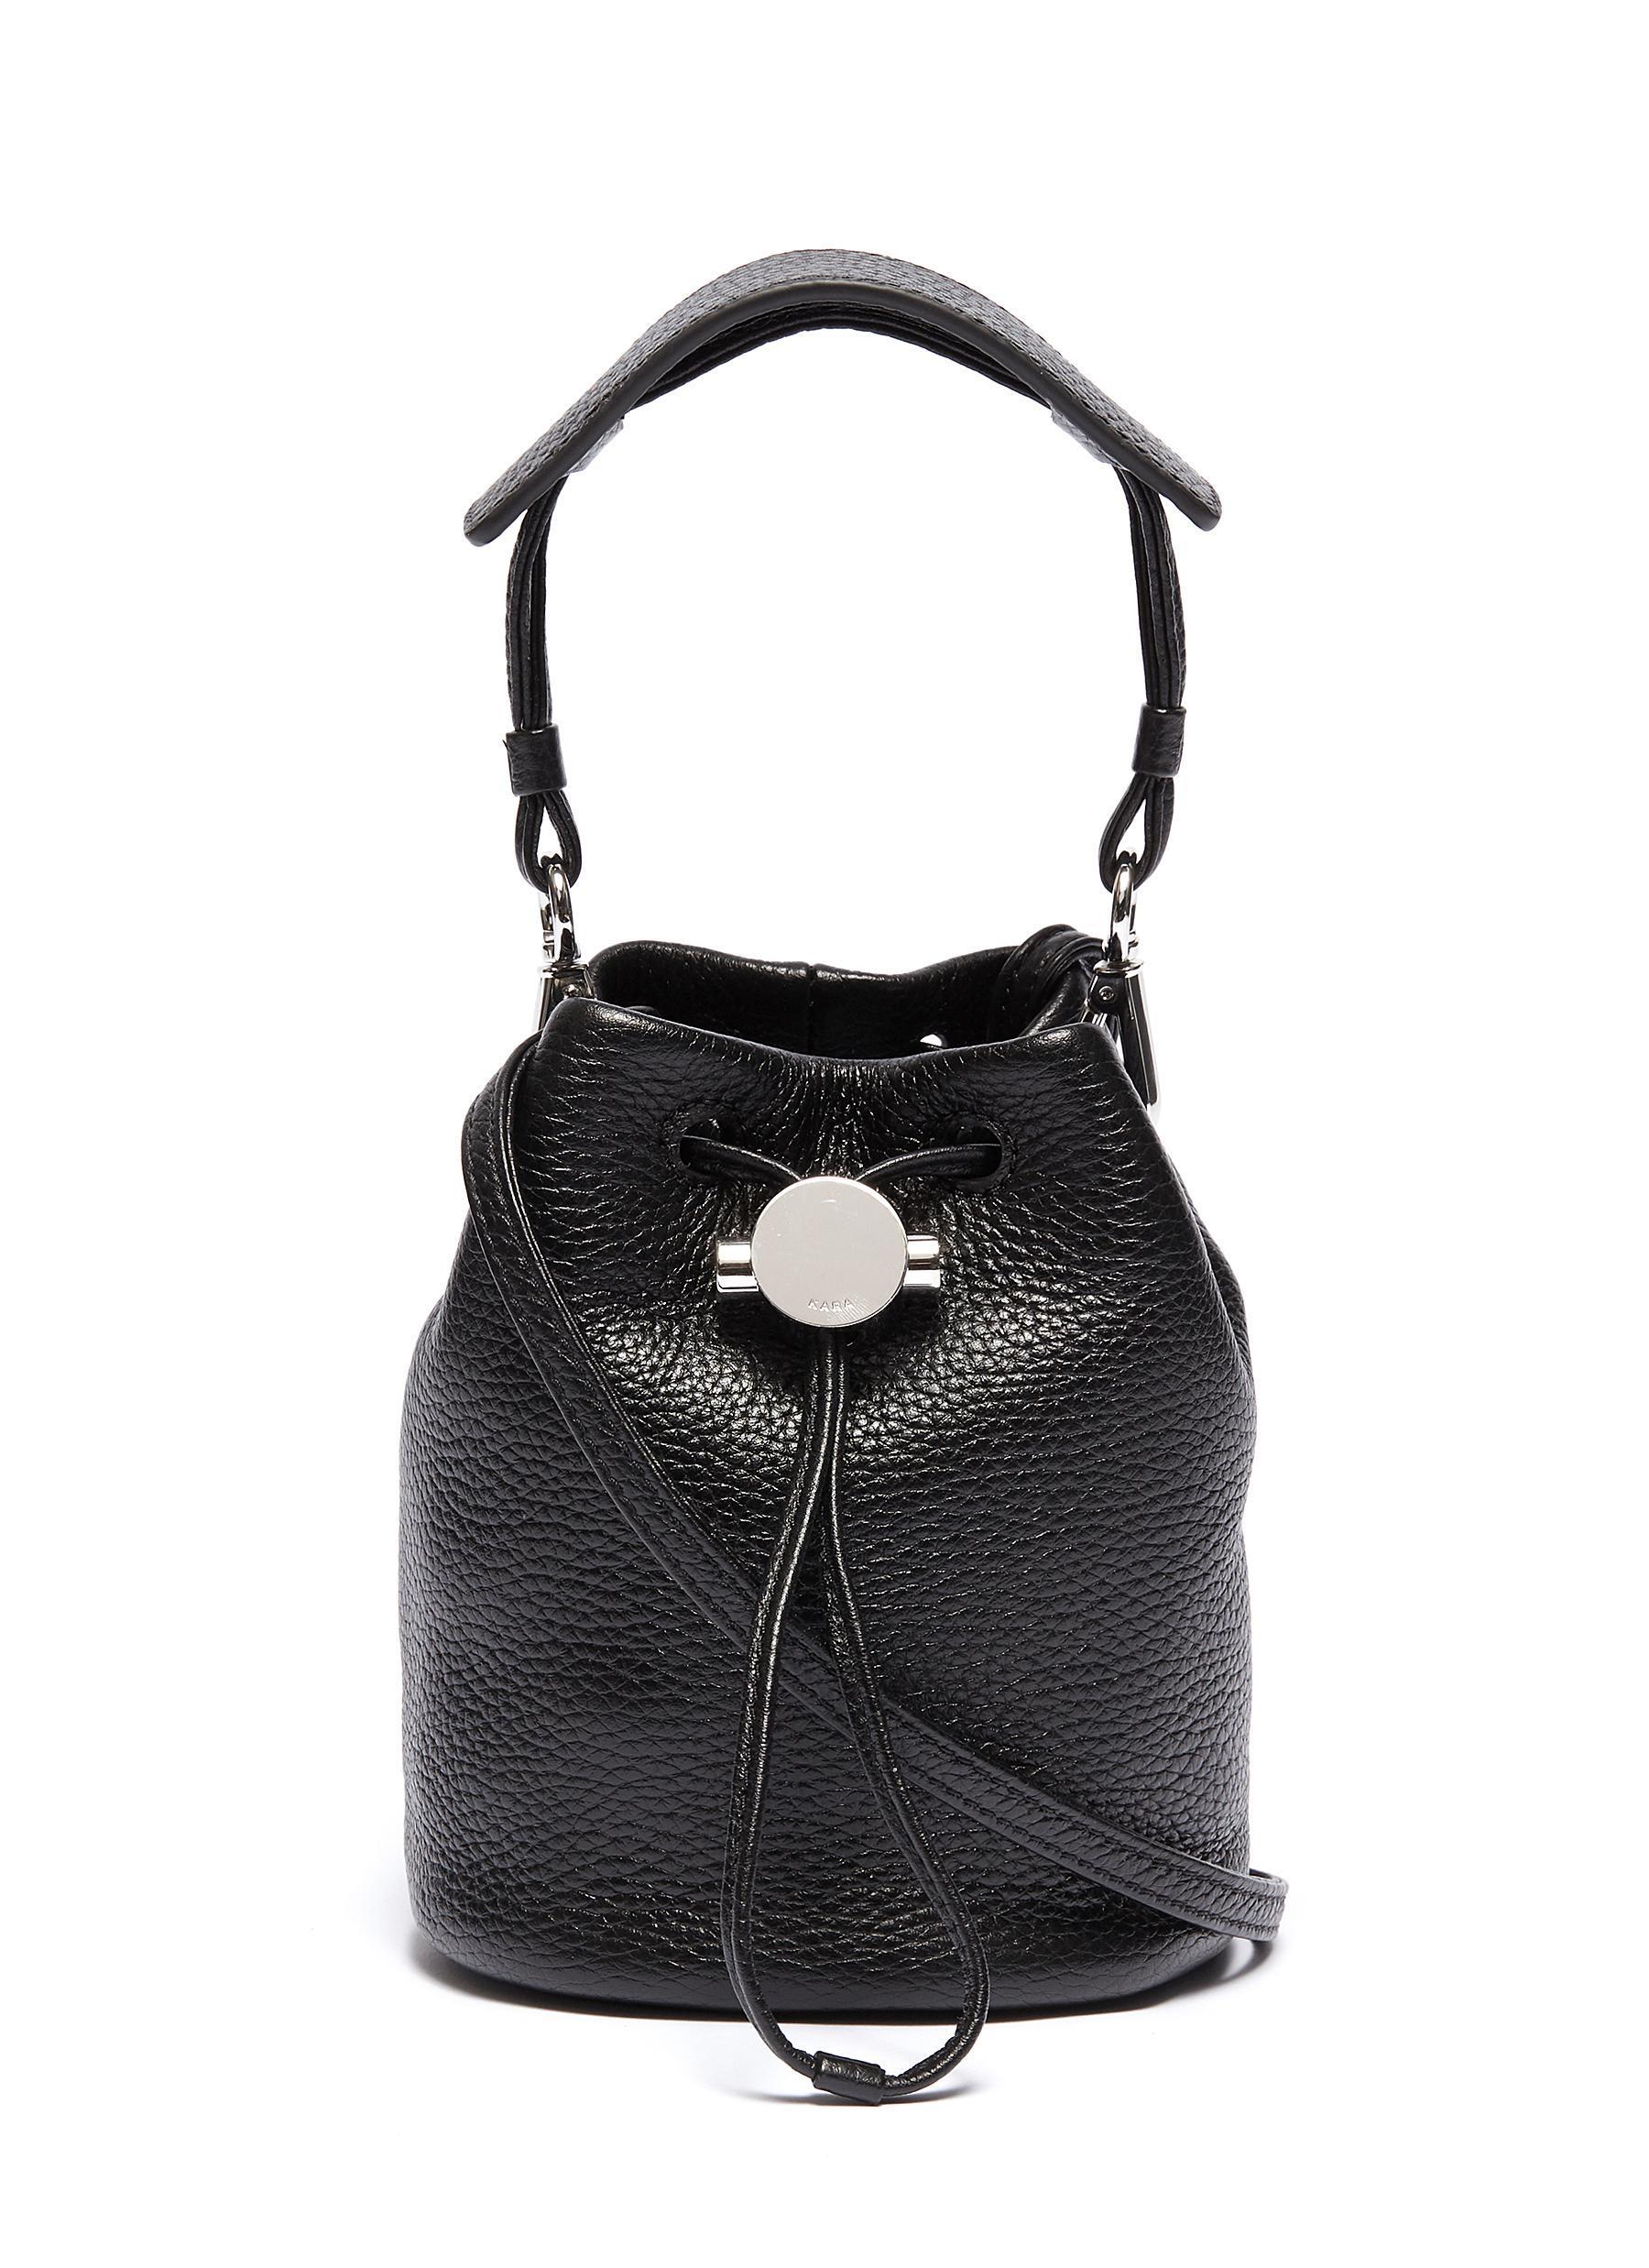 d3934926c0 Lyst - Kara  moon  Mini Leather Bucket Bag in Black - Save 3%